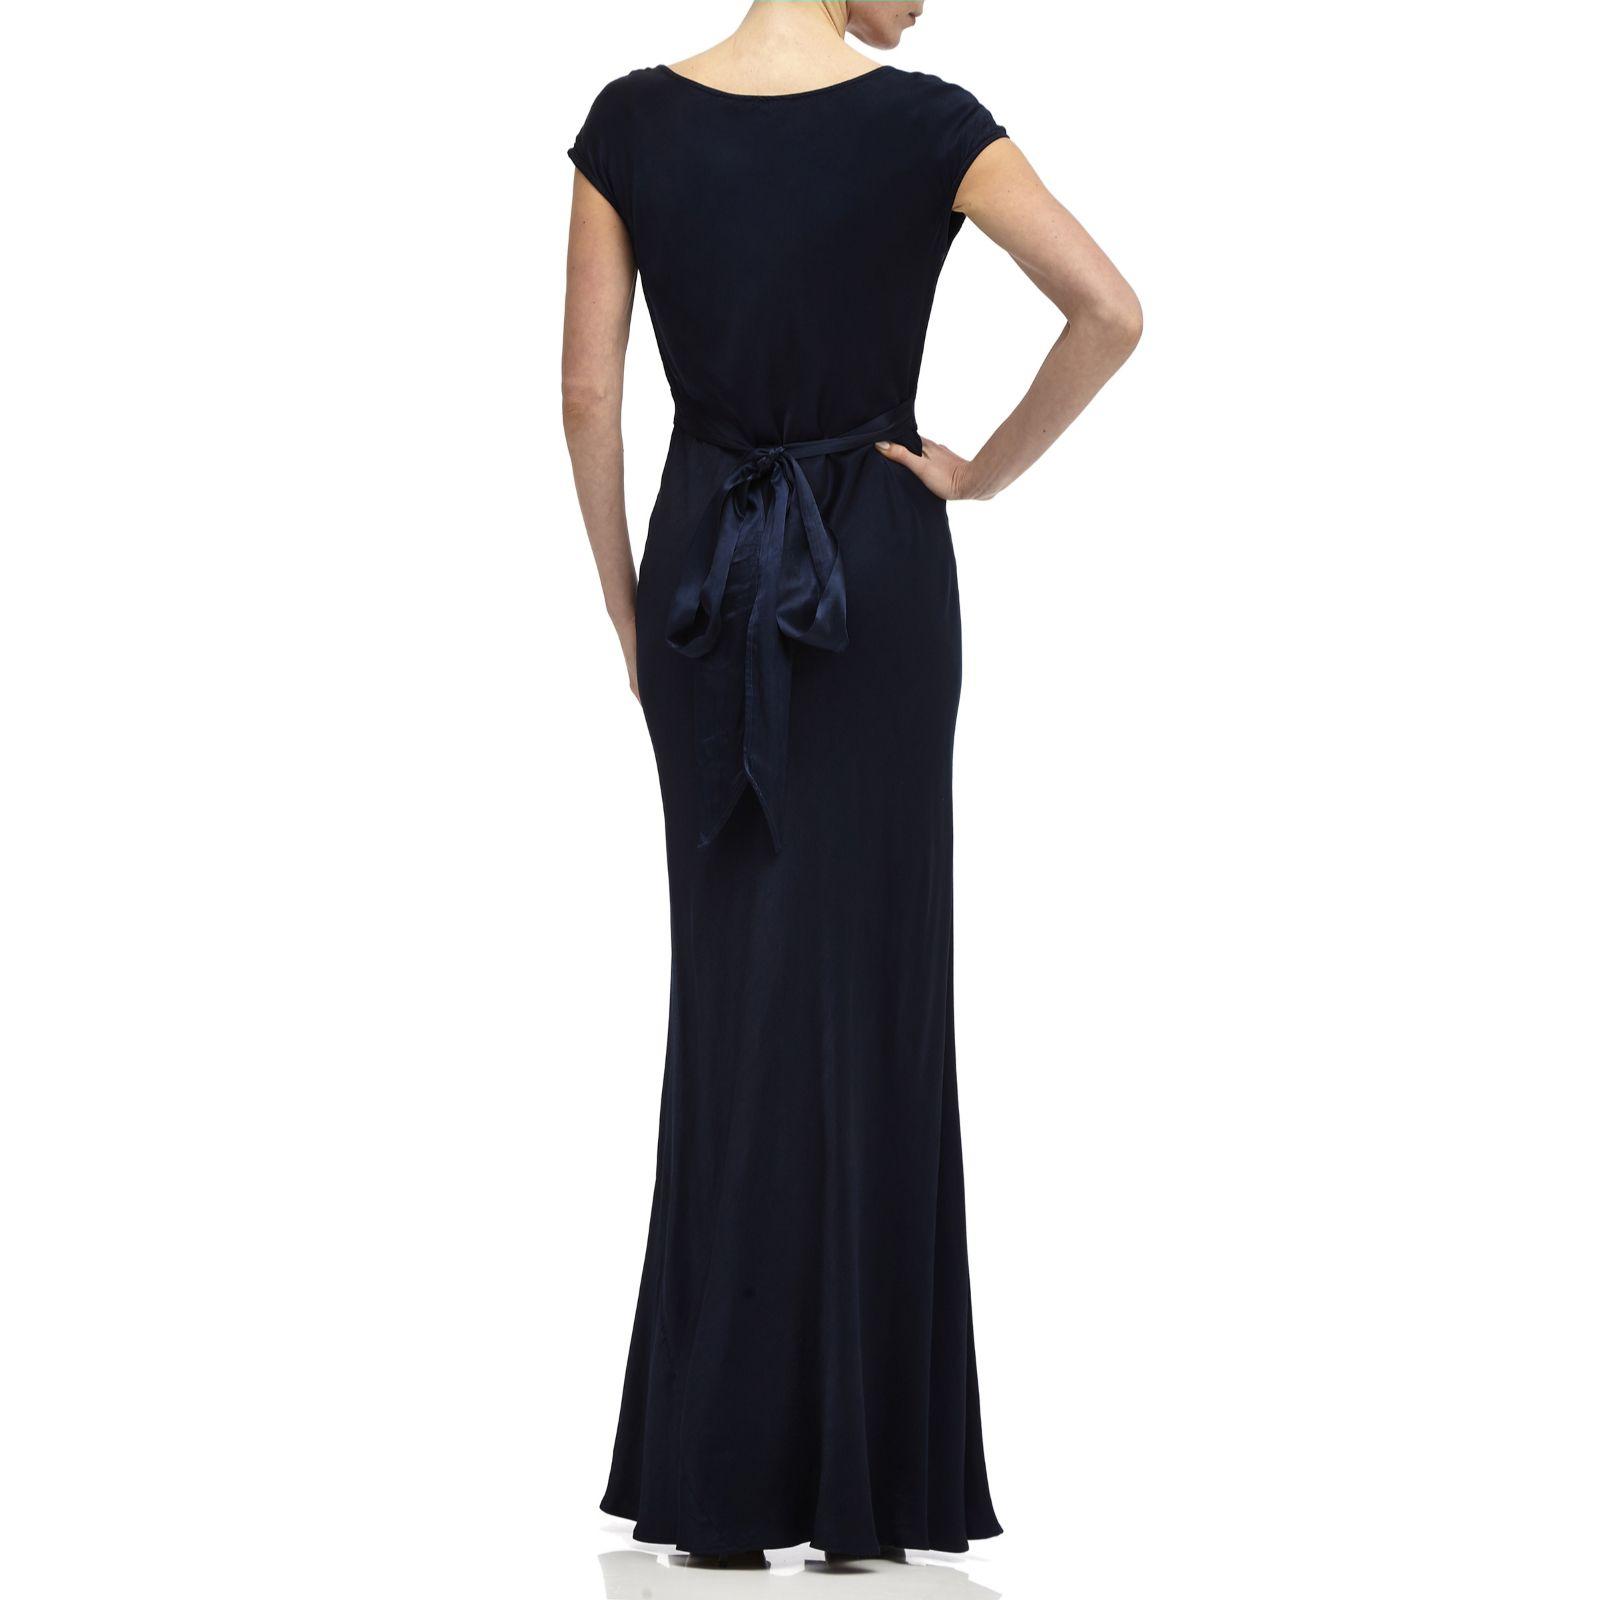 73b3c05b22 Ghost London Fern Satin Maxi Dress with Cowl Neck   Tie Back - QVC UK